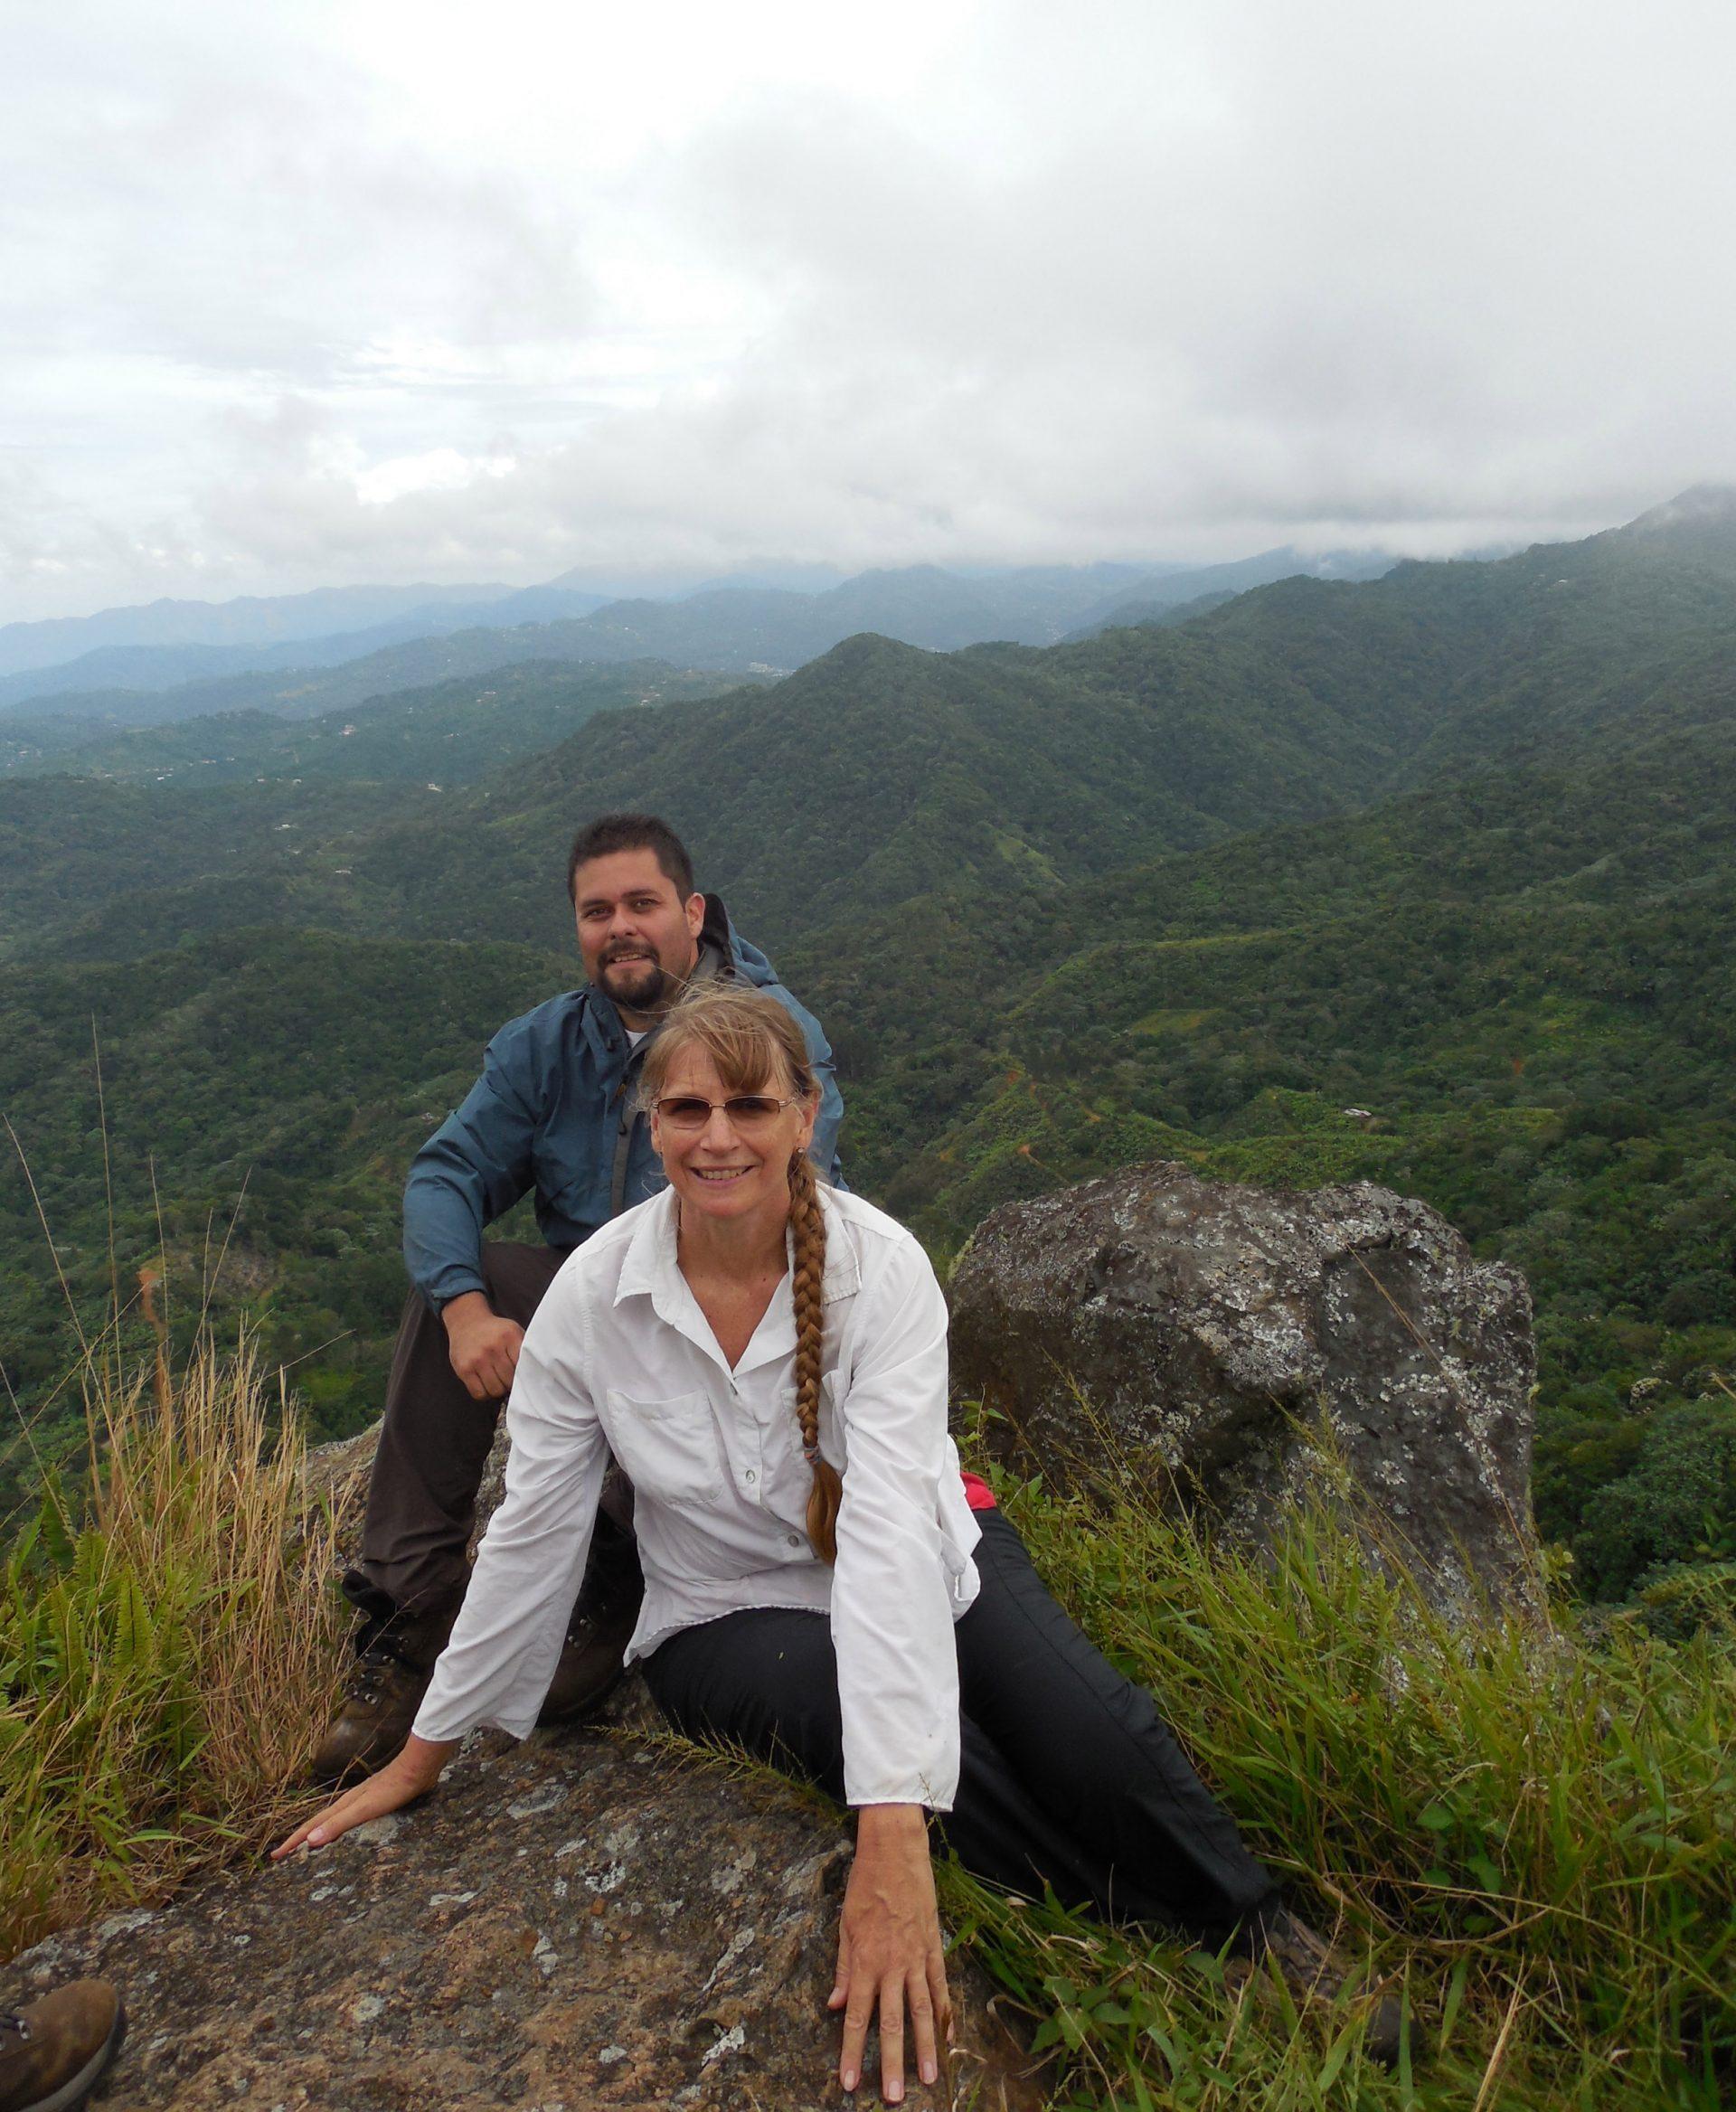 Joyce Maschinski with USFWS botanist Omar Monsegur near the summit of Silla de Calderón to collect Polystichum calderonense, November 2014.